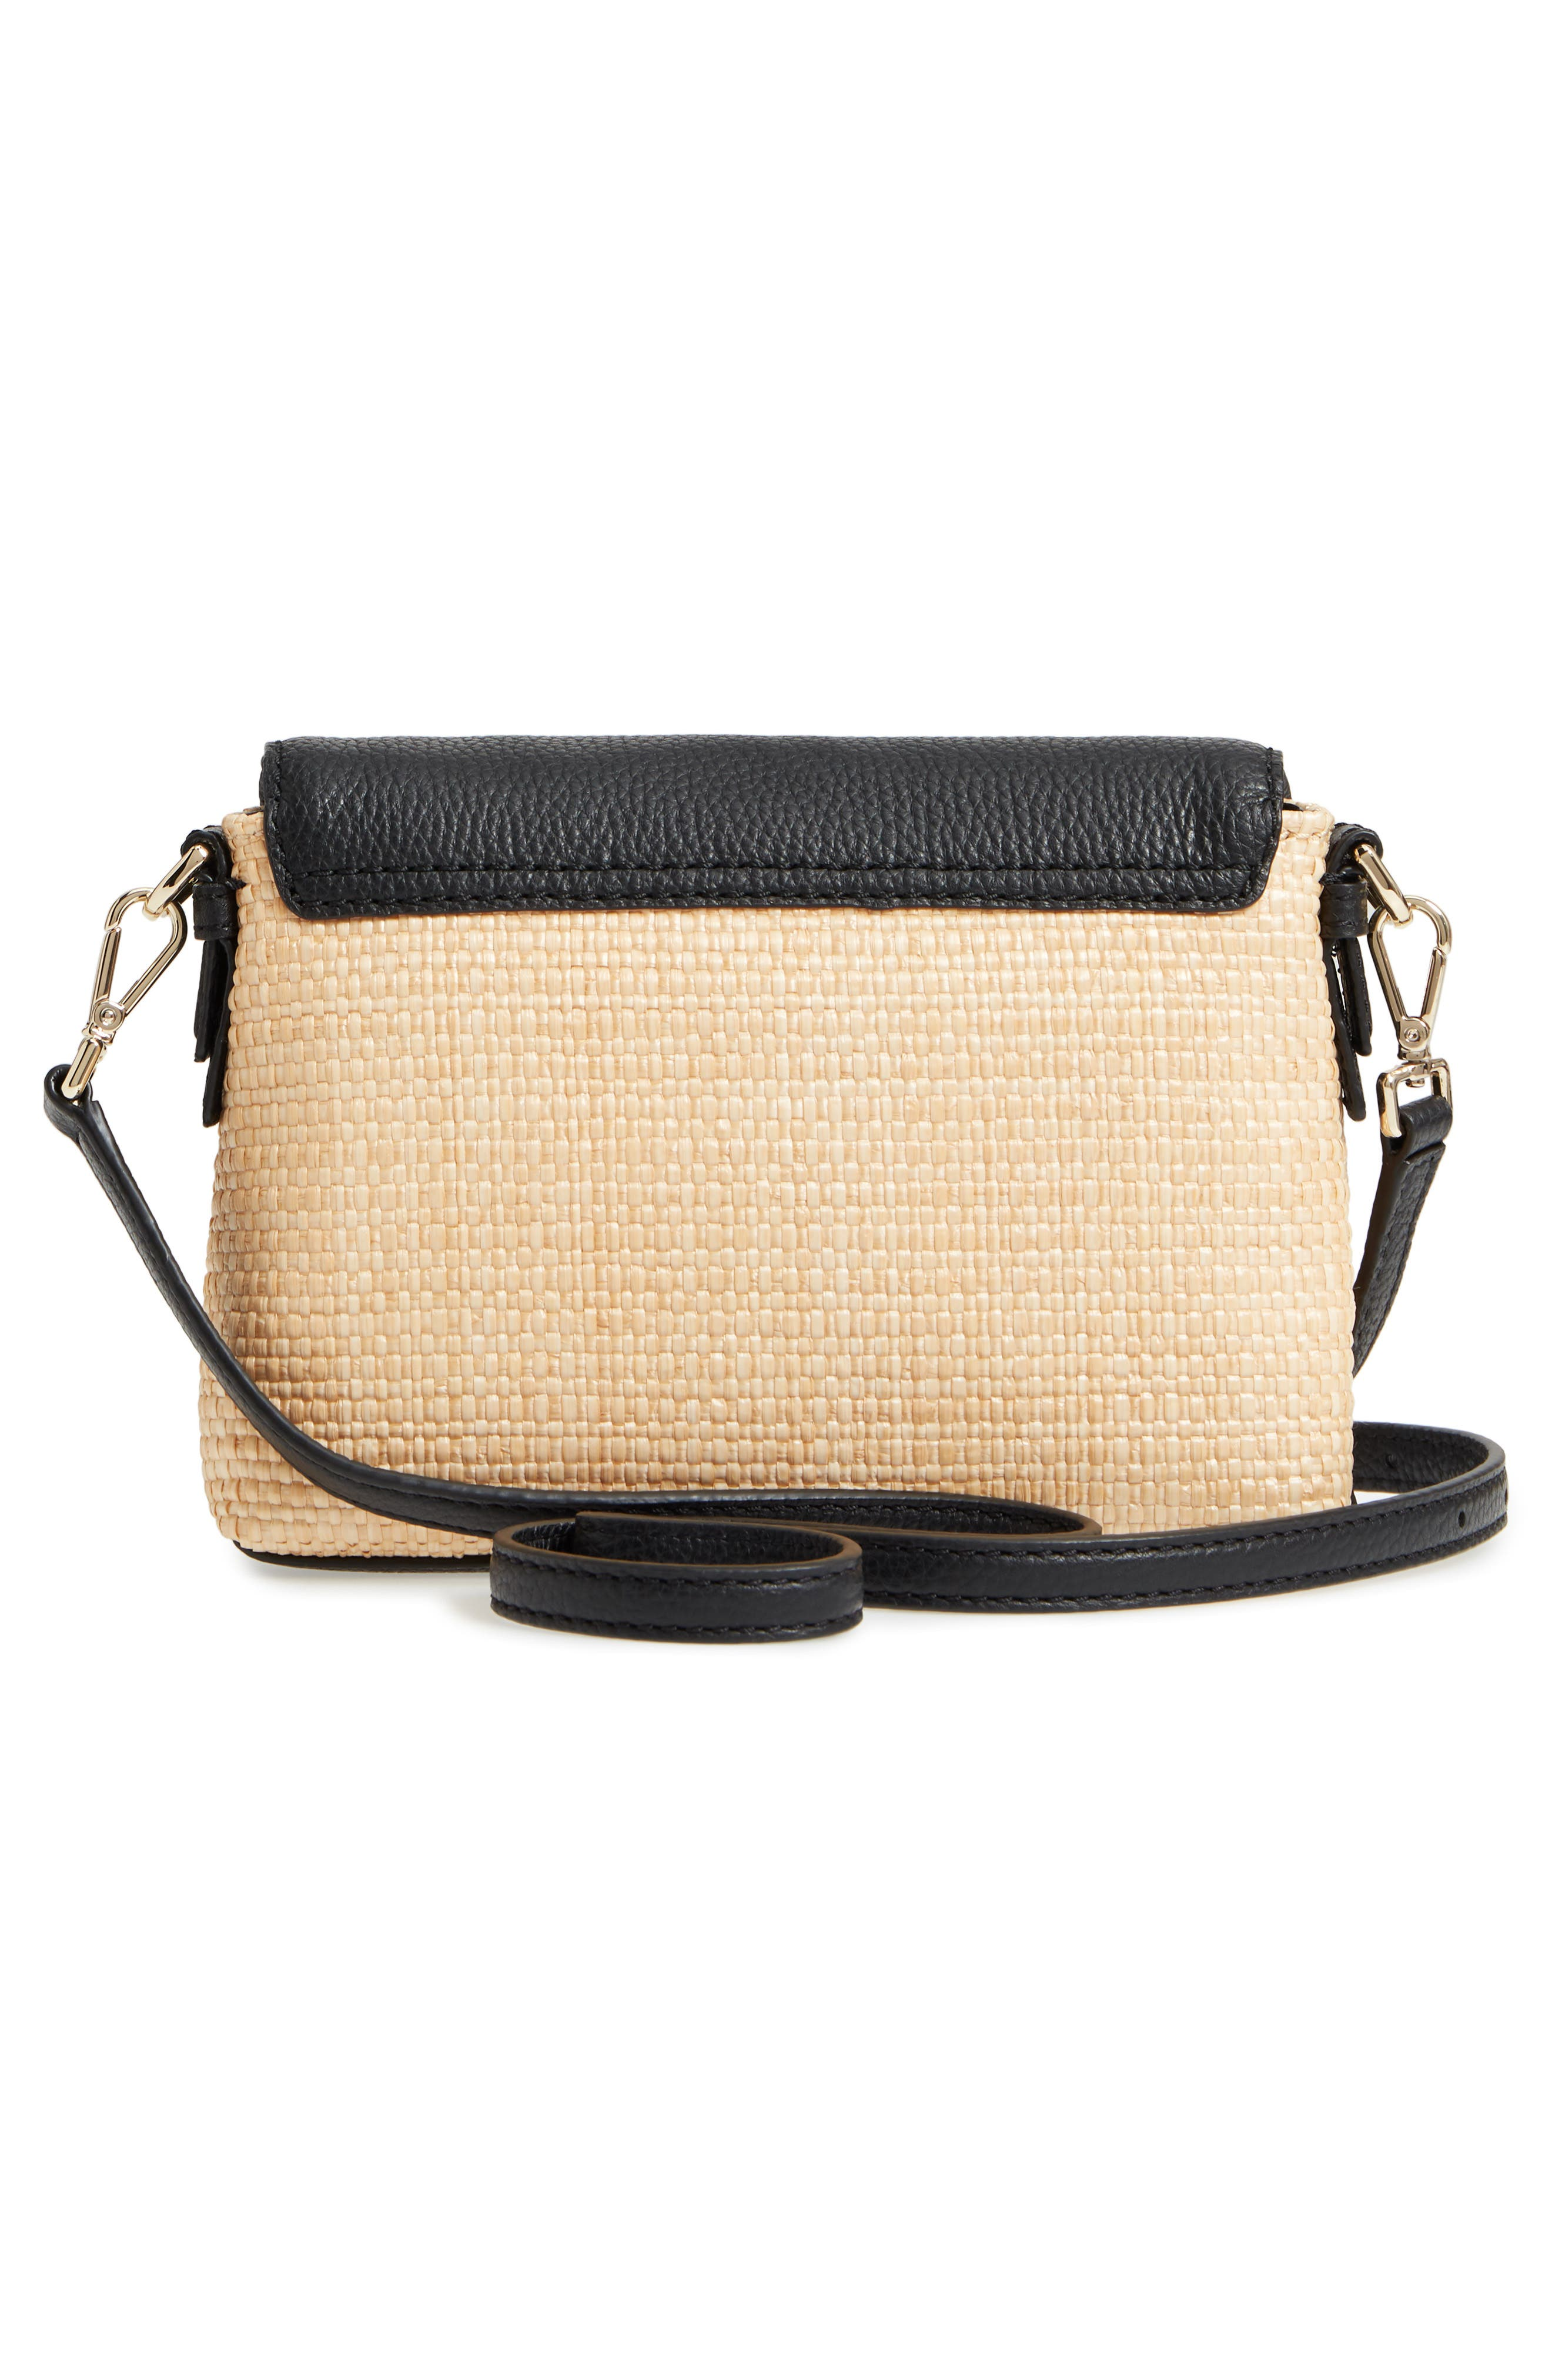 jackson street – harlyn straw & leather crossbody bag,                             Alternate thumbnail 3, color,